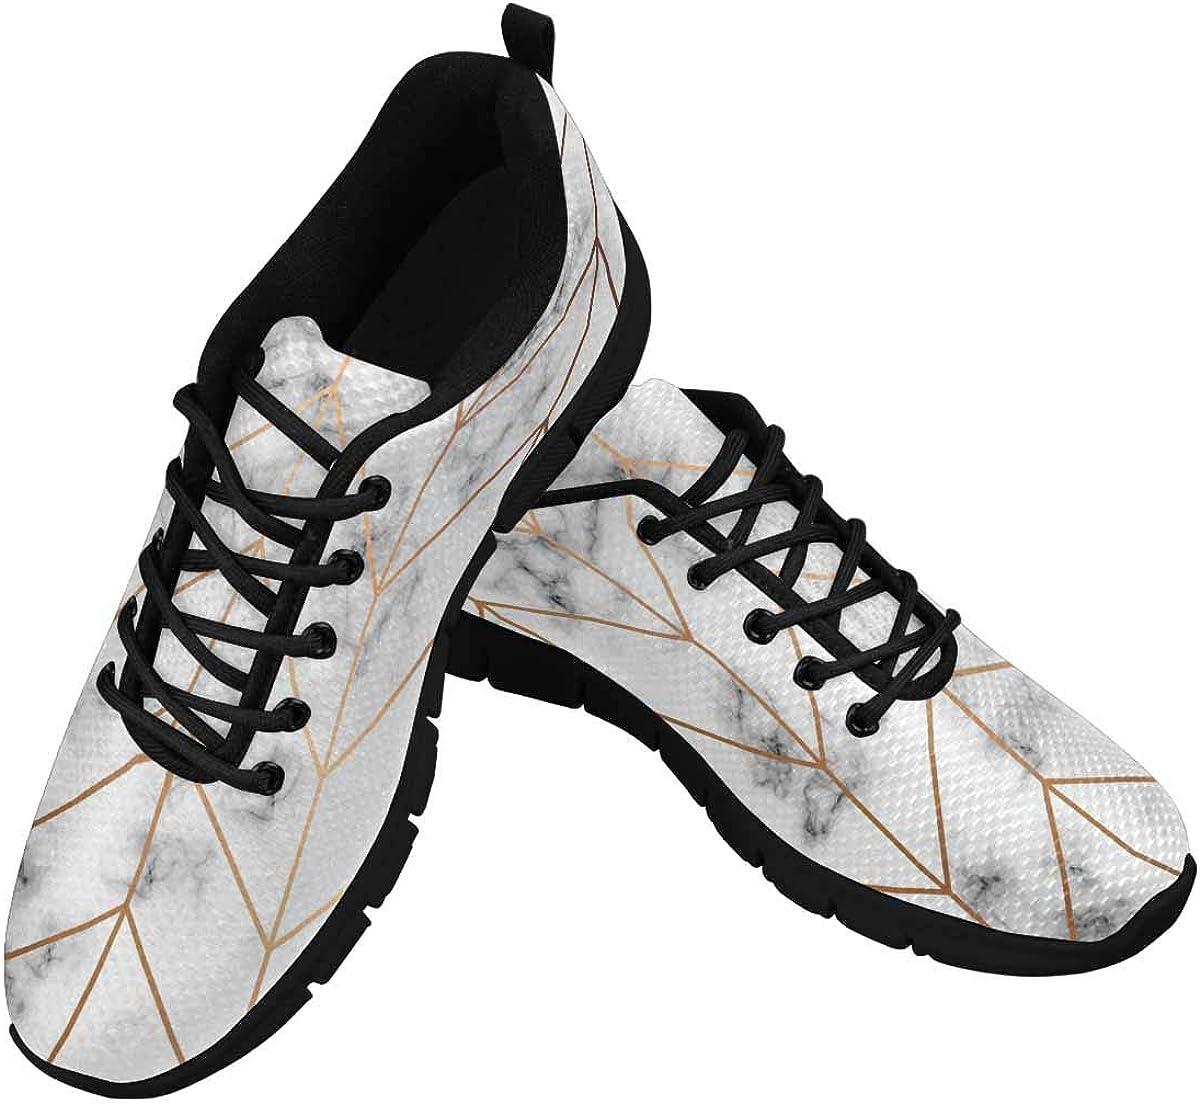 INTERESTPRINT Abstract Retro Pattern Women's Tennis Running Shoes Lightweight Sneakers